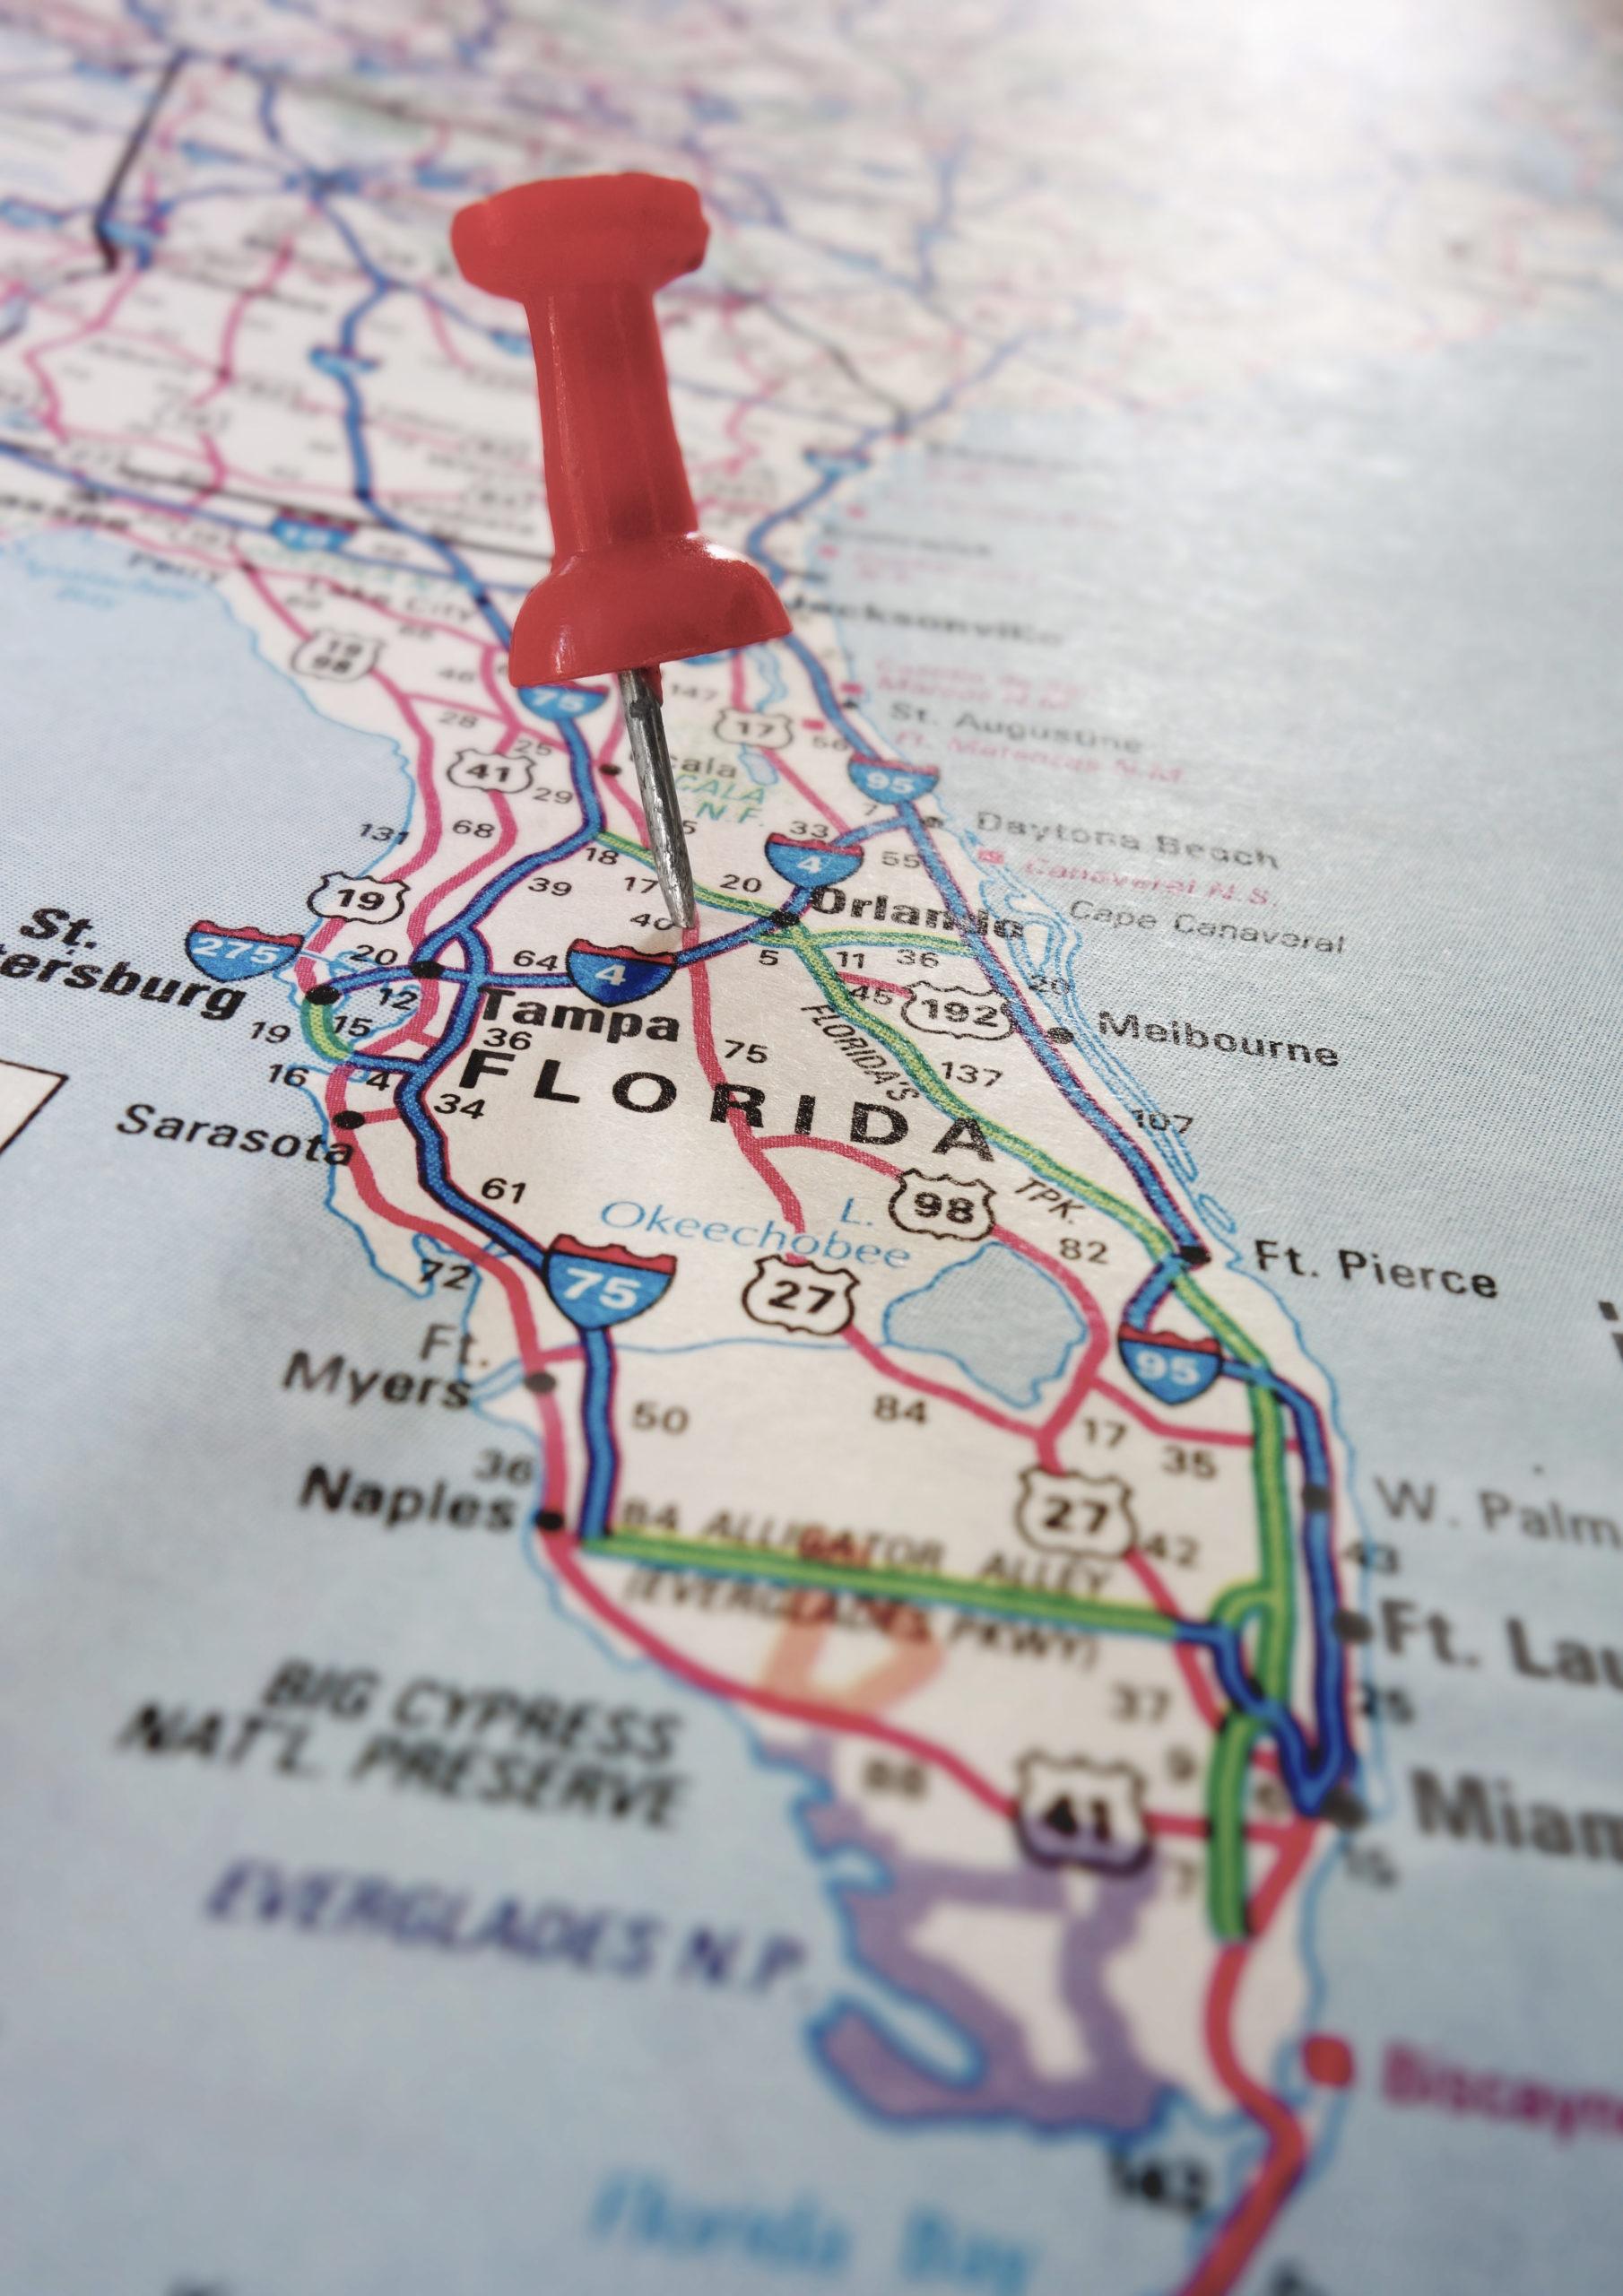 Closeup of a Florida map with a red push pin